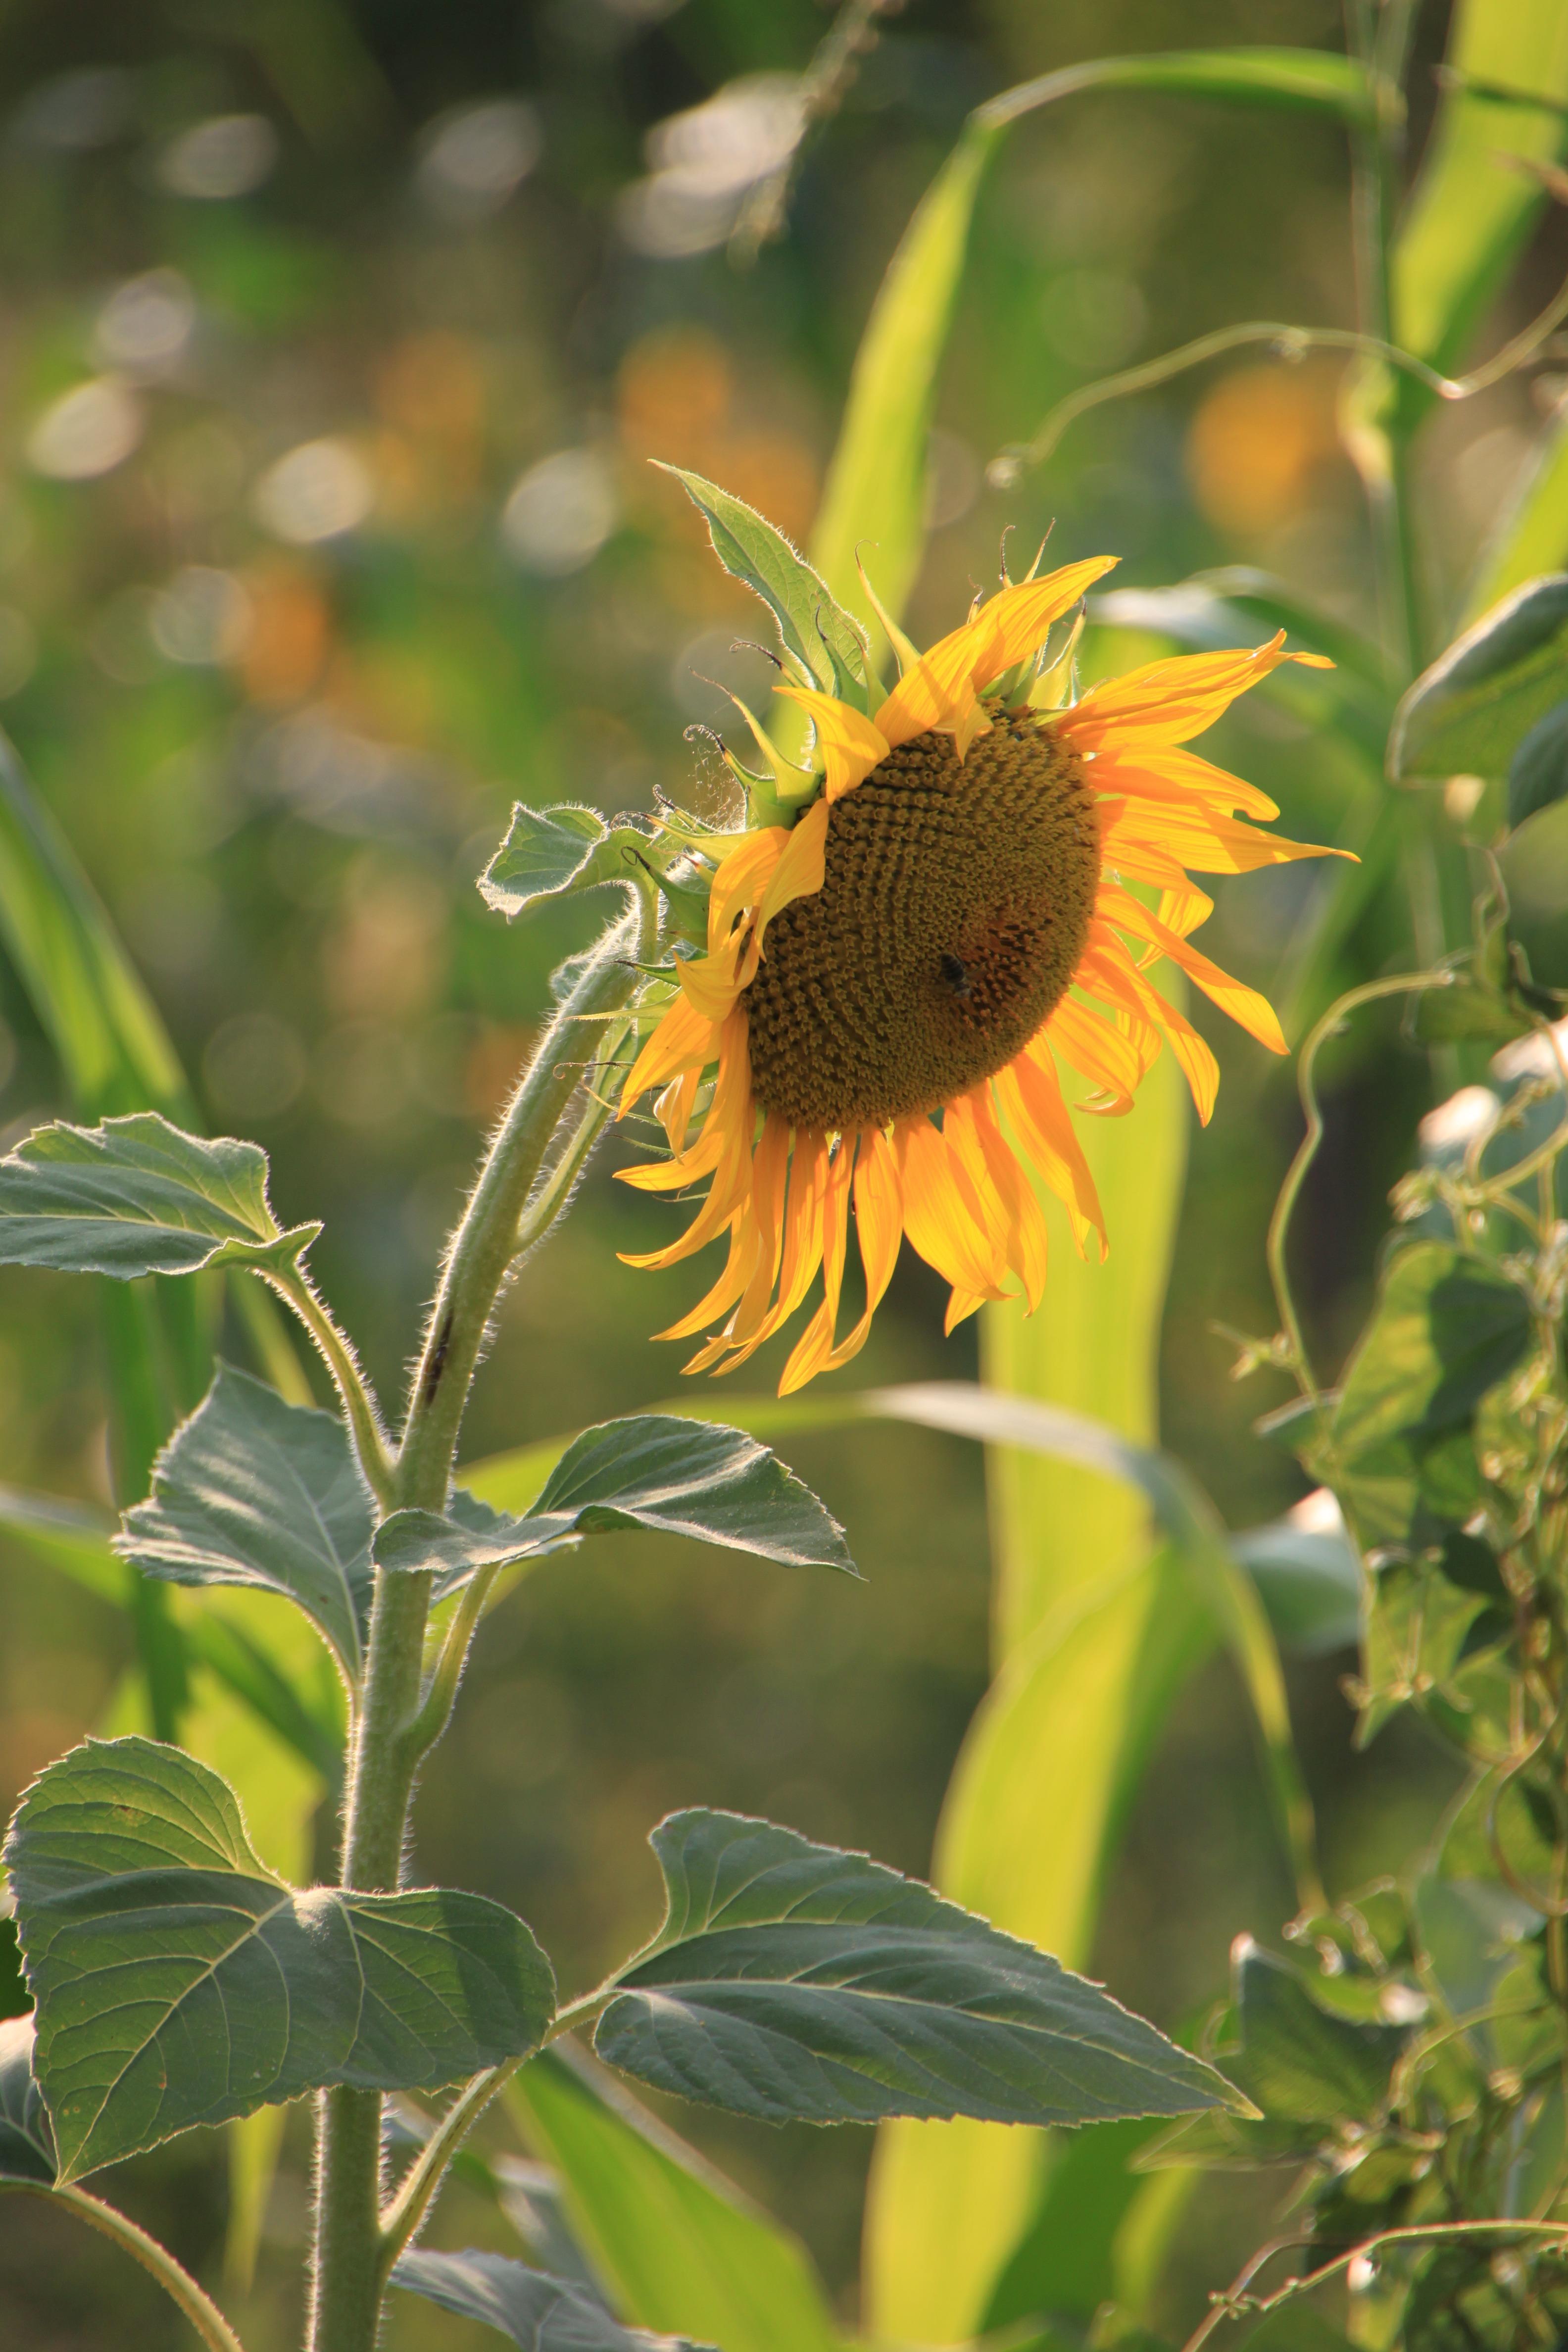 flowers-helianthus-sun-sunflower-sunflowers-yellow-plants-1248575 Job Form on pennsylvania state tax, income tax,